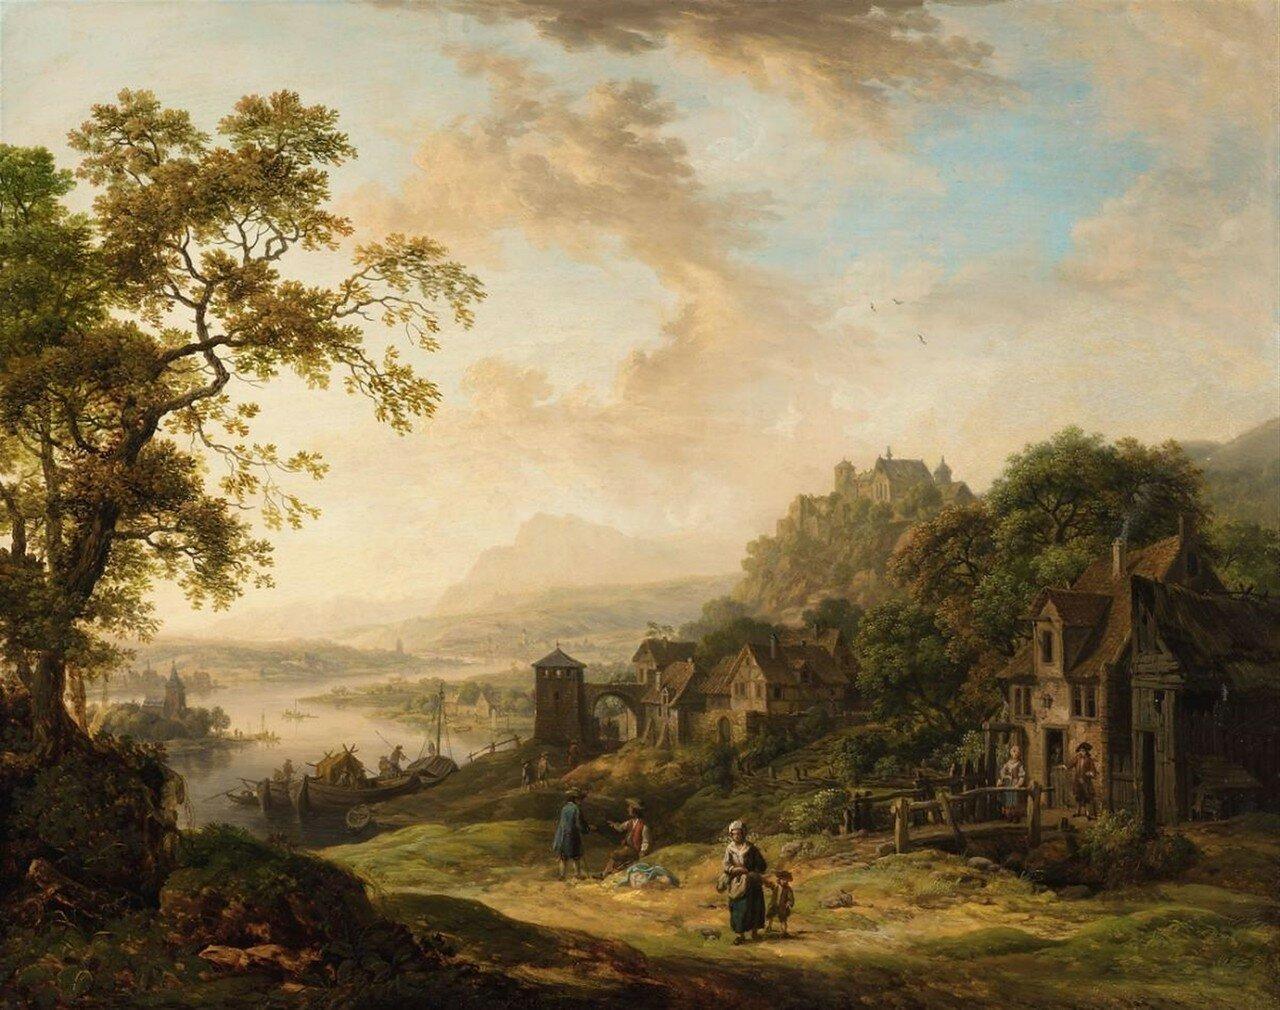 Rhine-Landscape-with-a-Ra-a_100d16f5a8.jpg